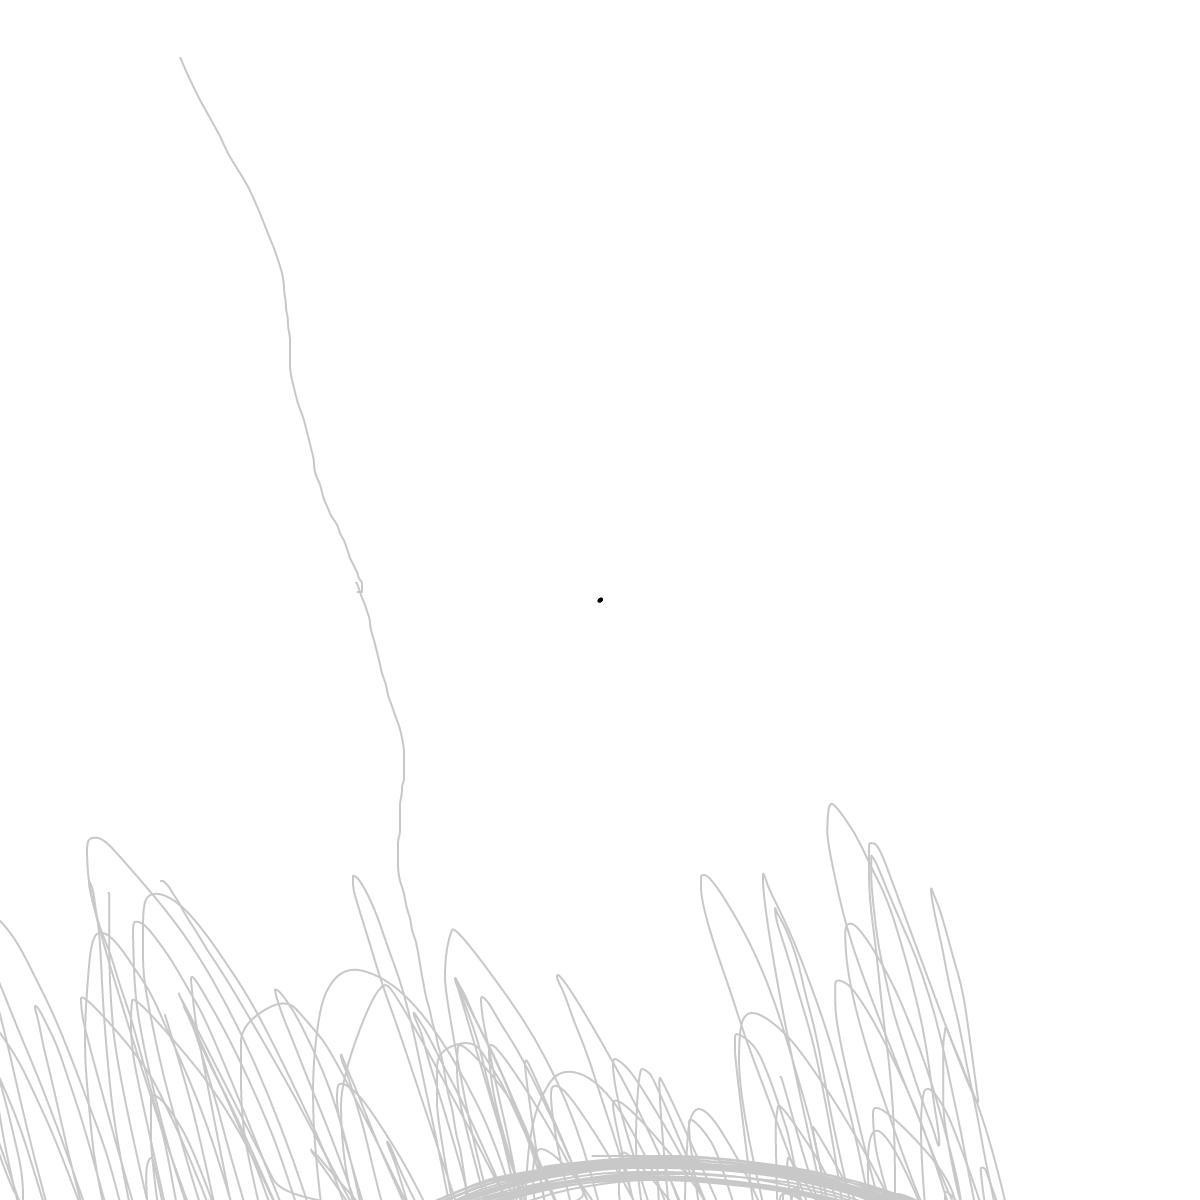 BAAAM drawing#9062 lat:52.4885406494140600lng: 13.4249334335327150